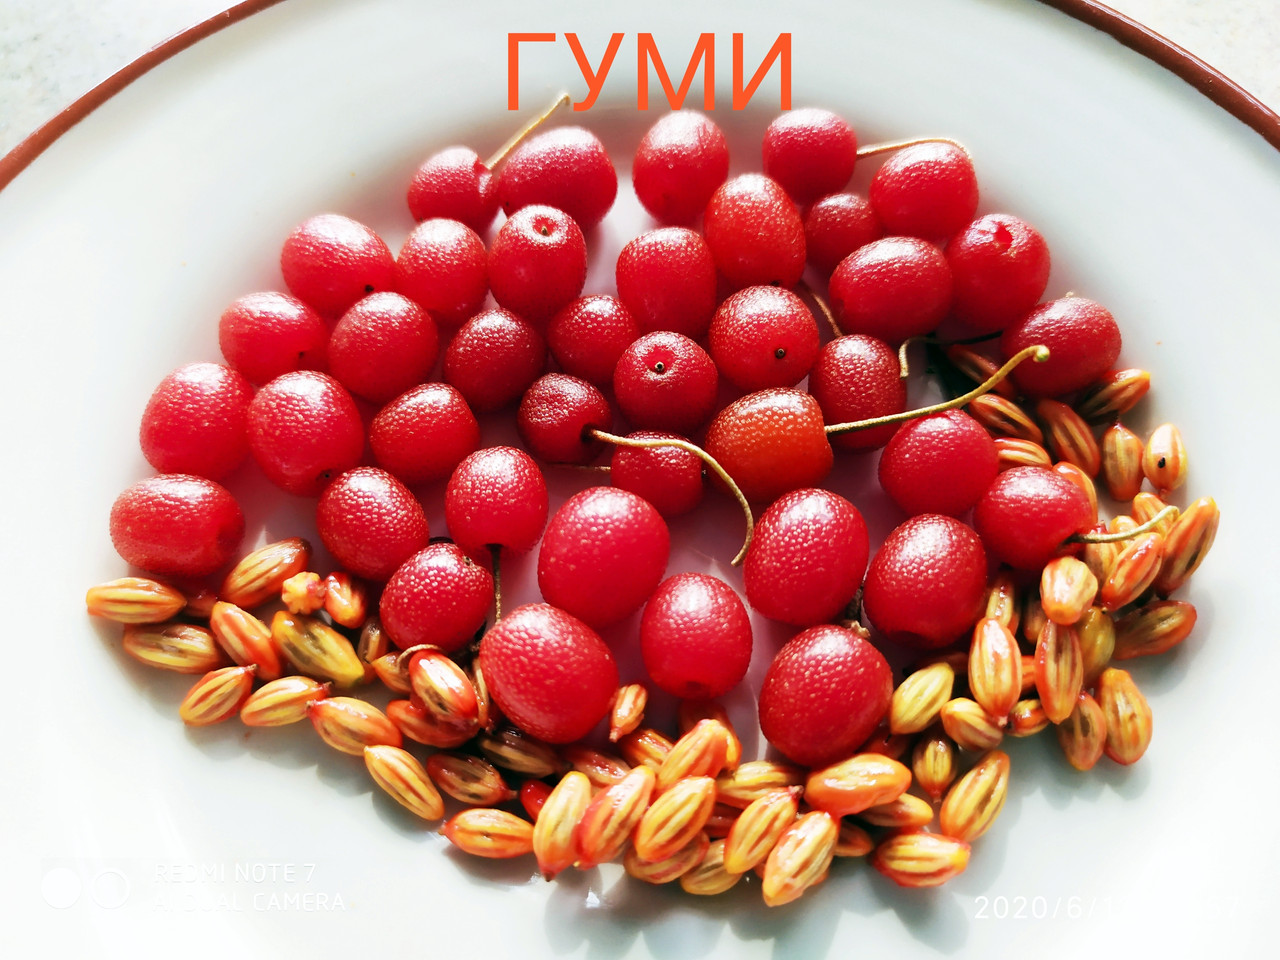 Гуми семена